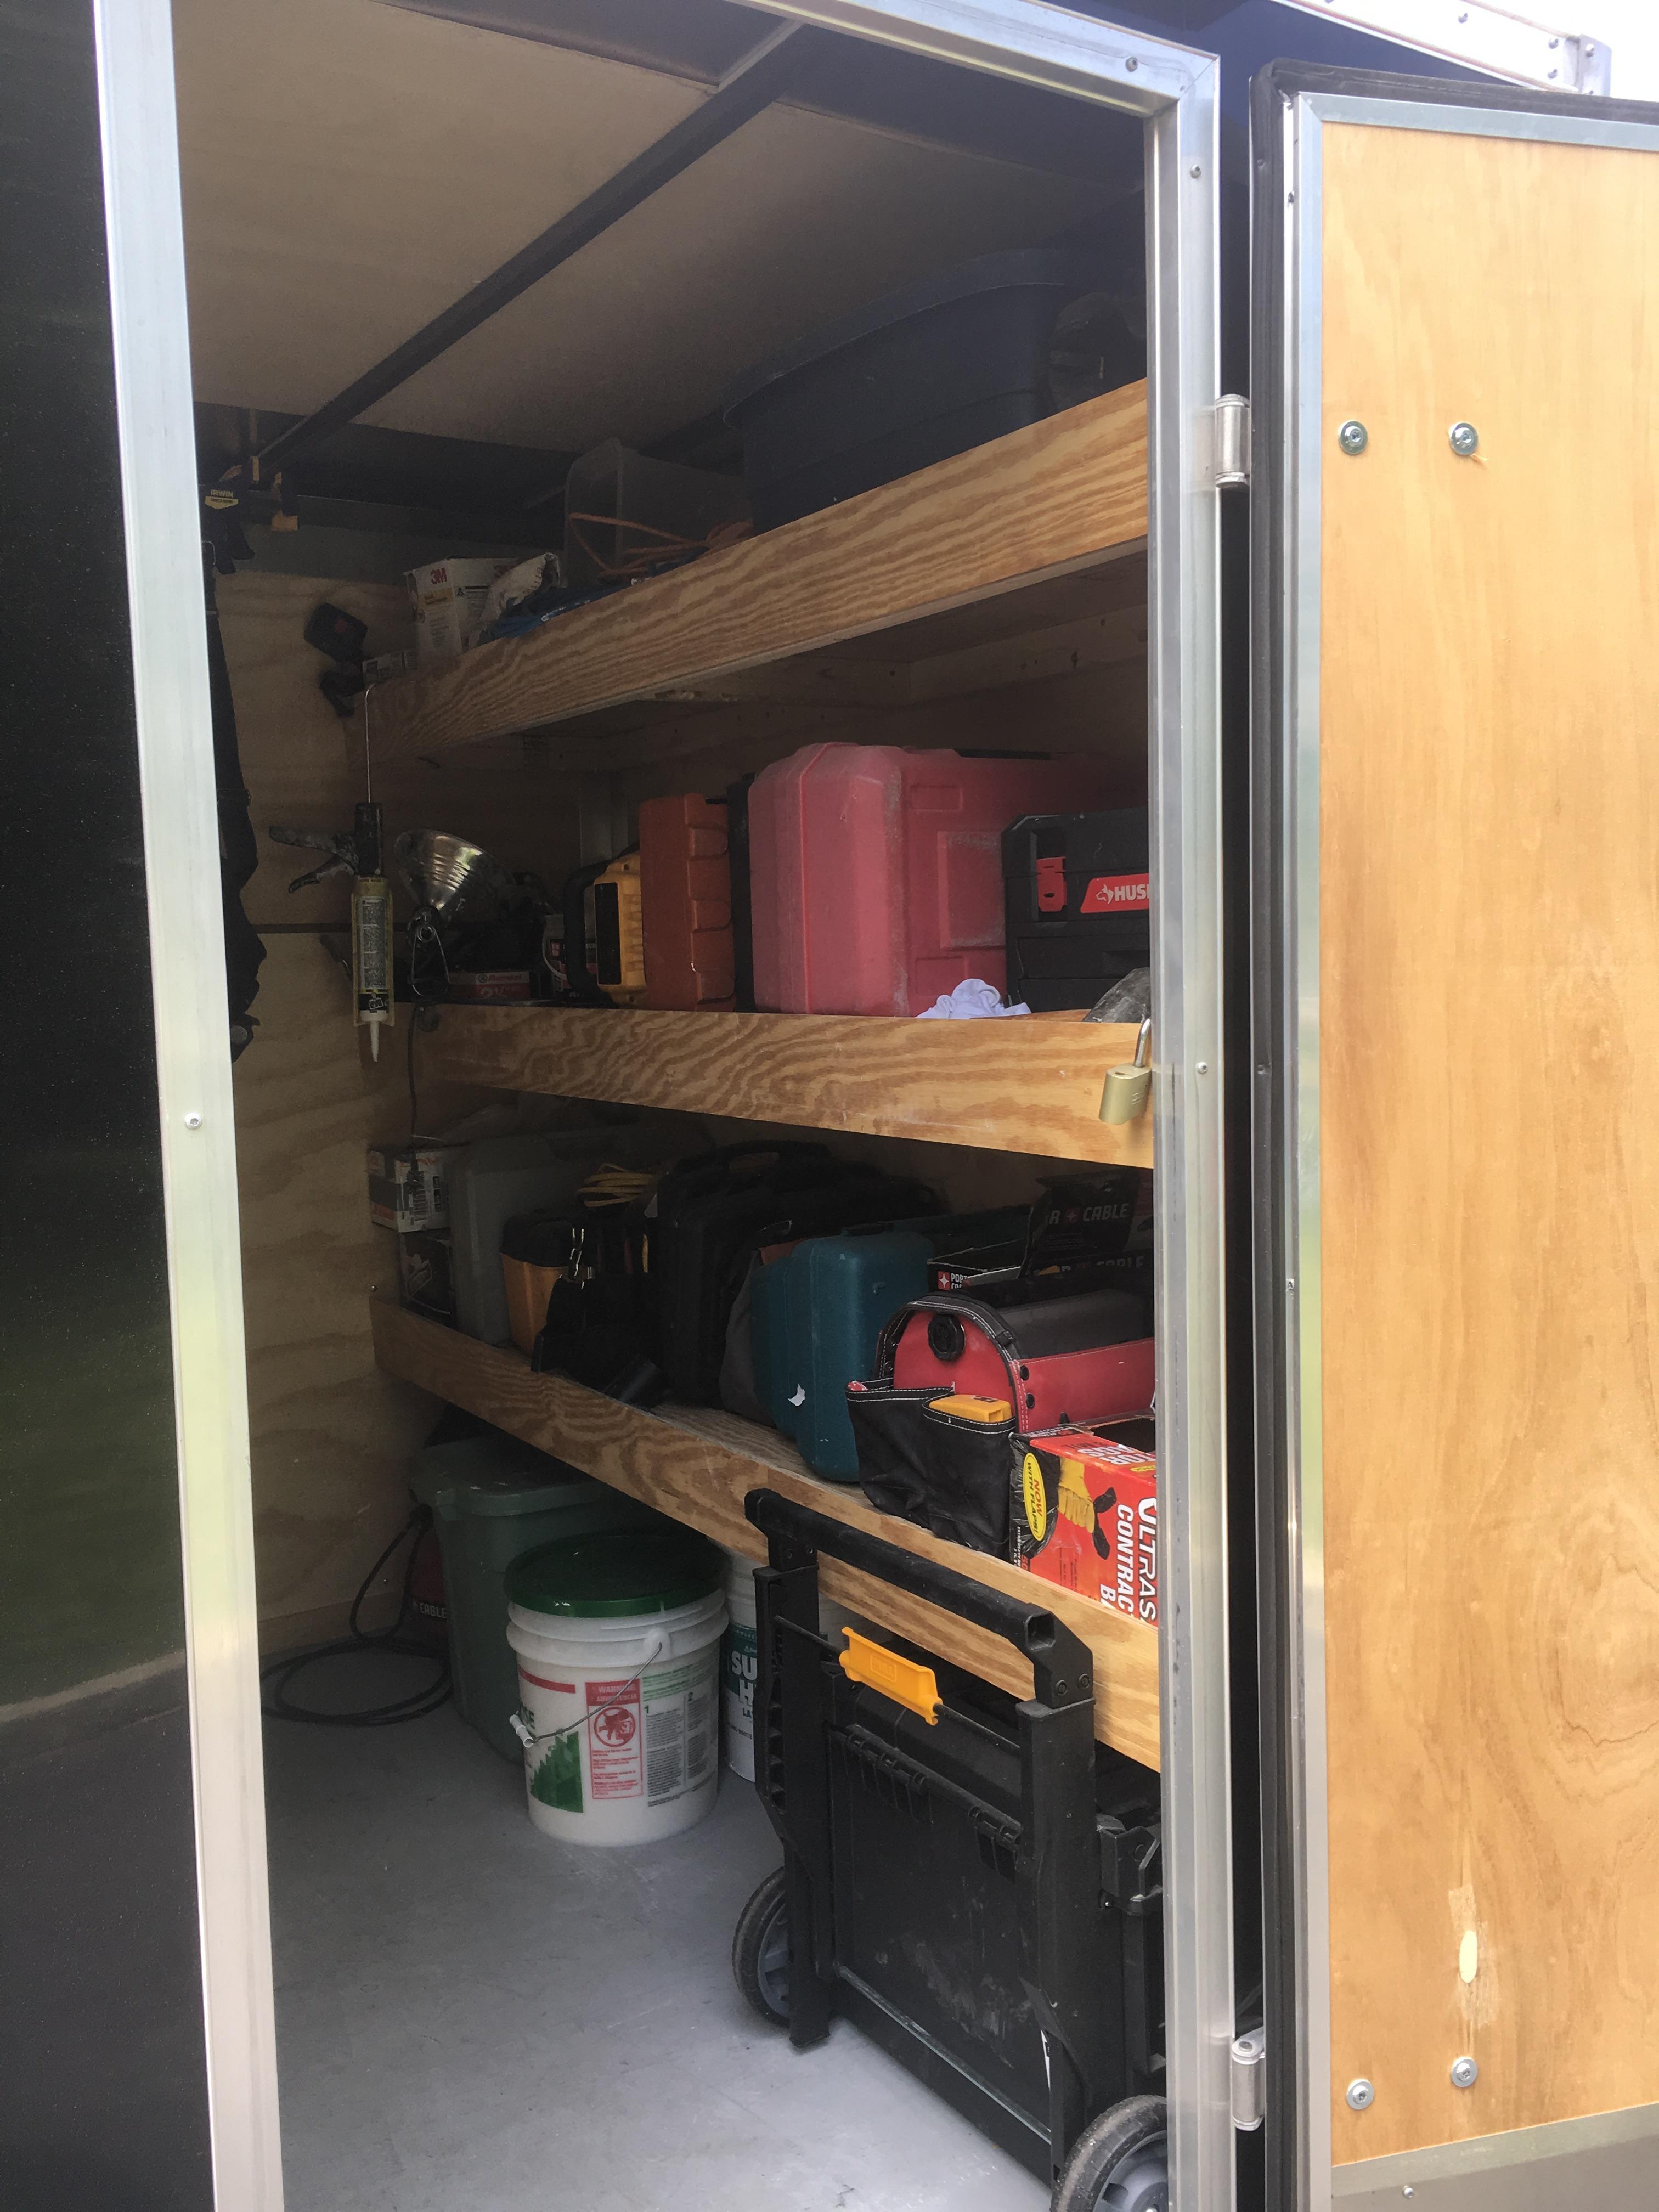 Finally got my 7x14 trailer set up-33463216-bc30-47a6-b317-b8fb381938a9_1528046339740.jpeg